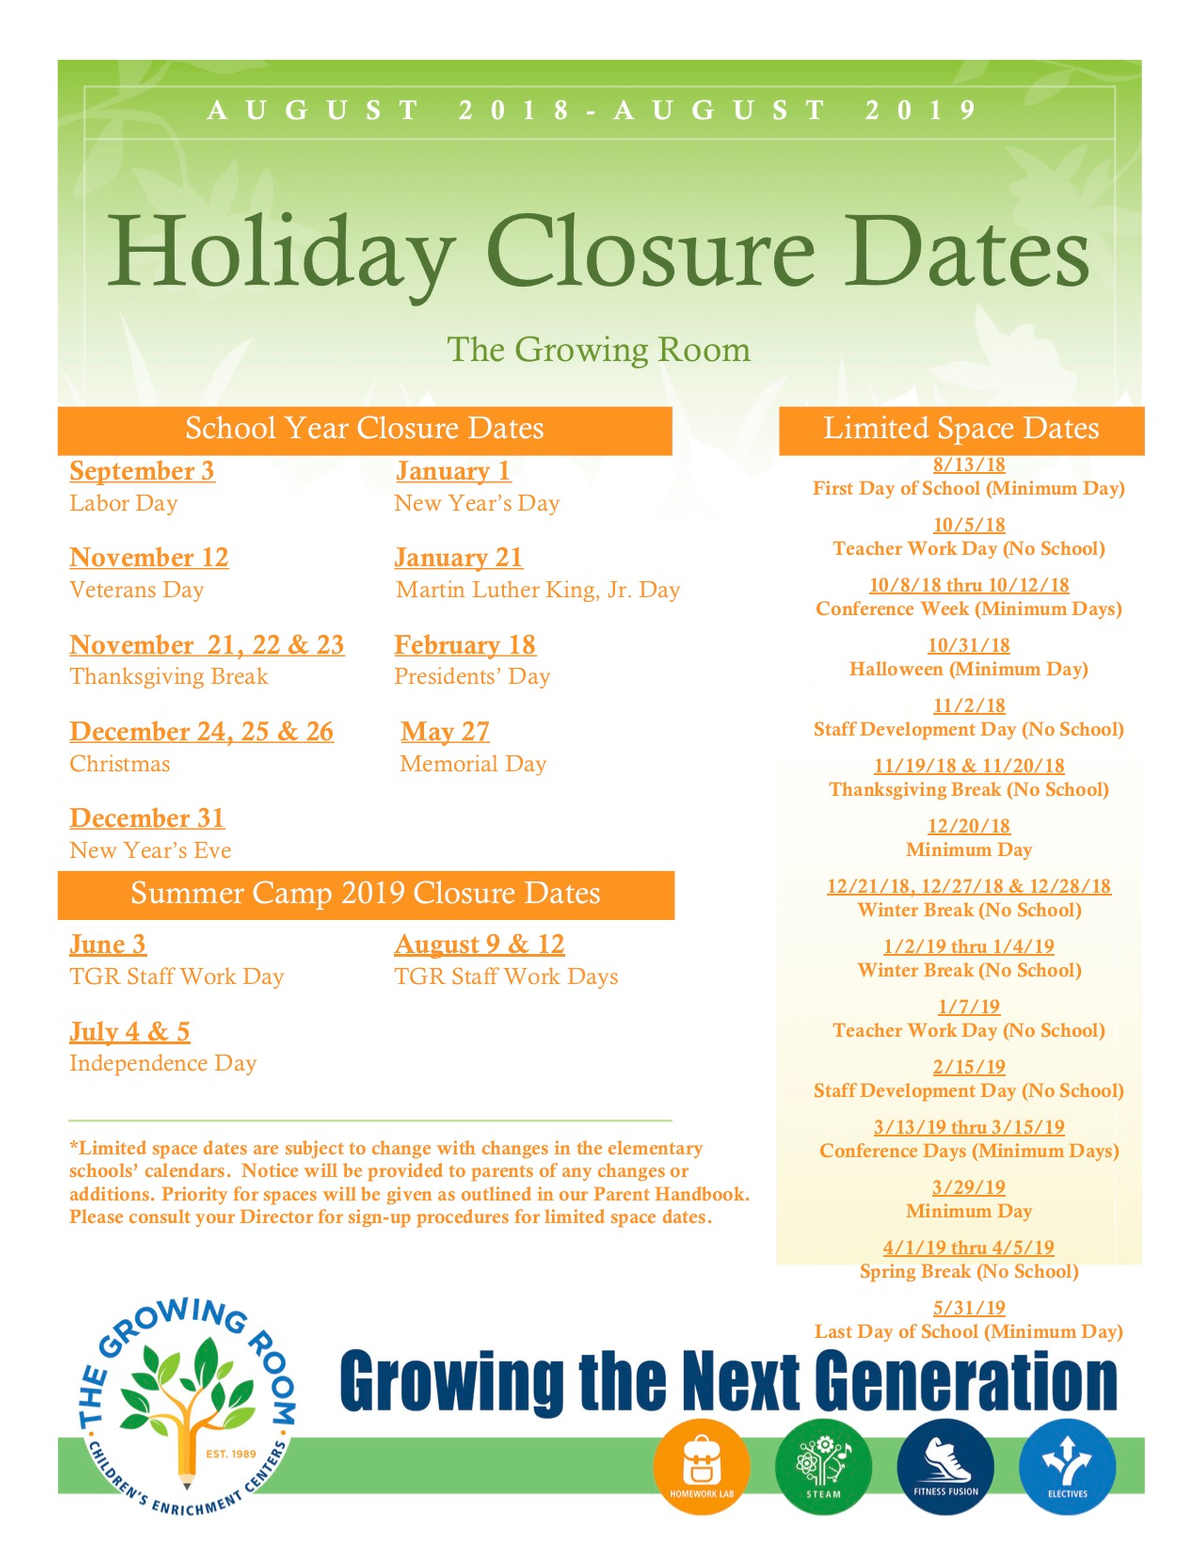 Holiday Closure Dates 2018-2019 .jpg